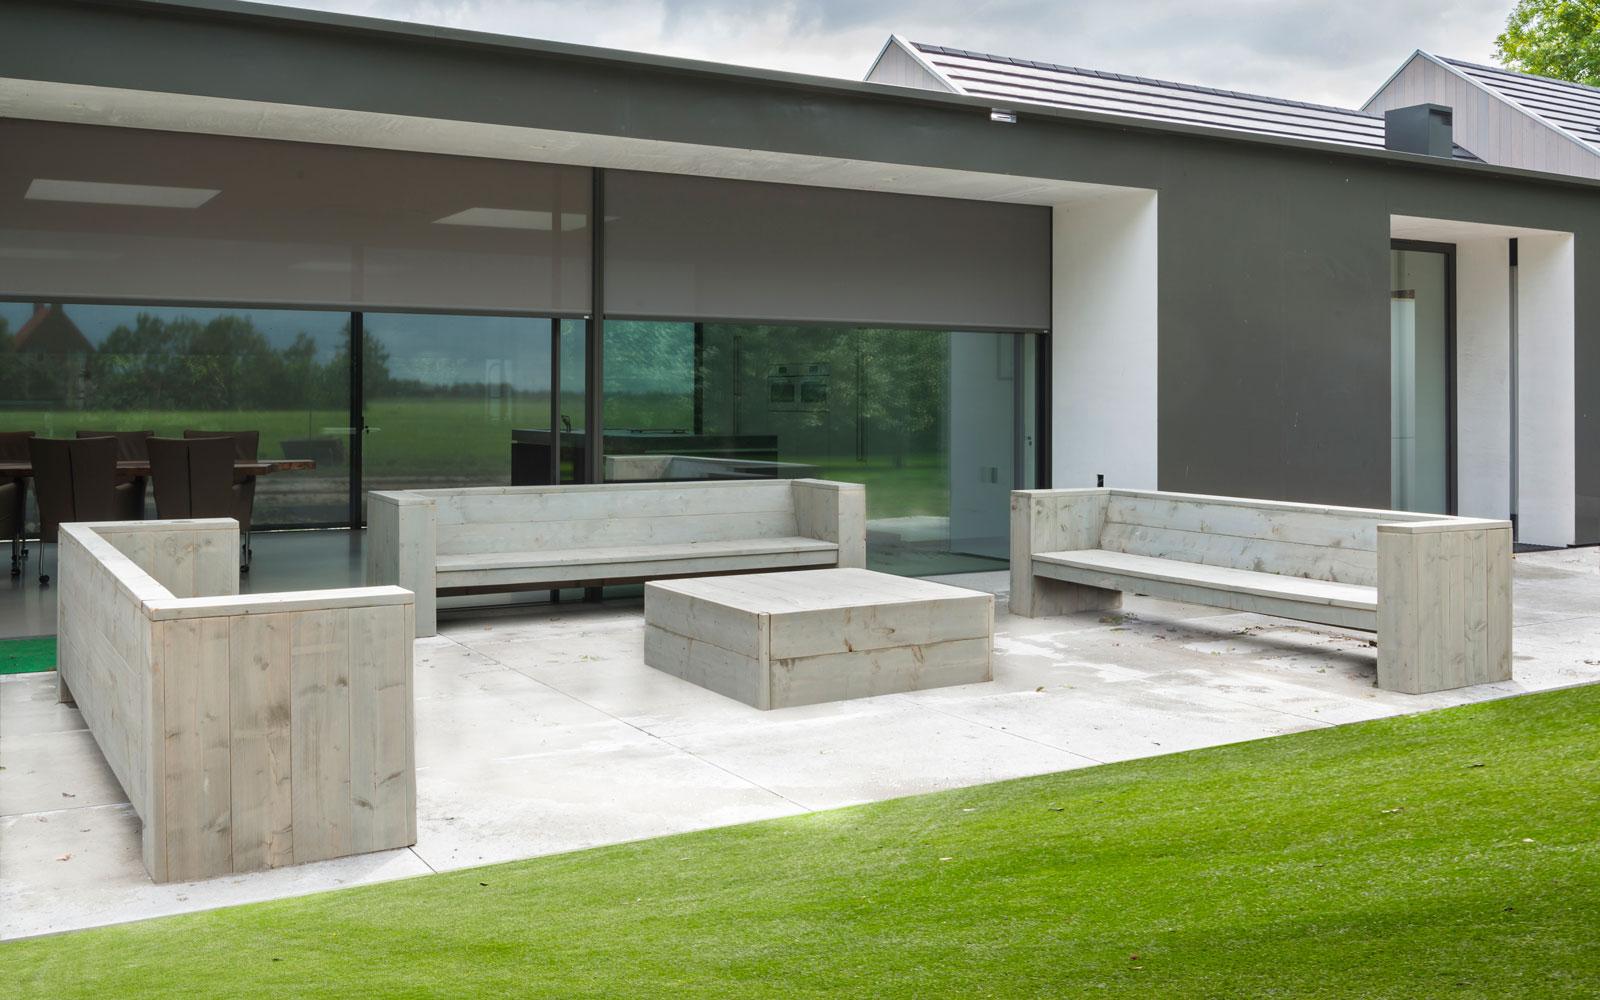 Terras, grote ramen, screens, tuin, moderne uitbouw, Lautenbag Architectuur